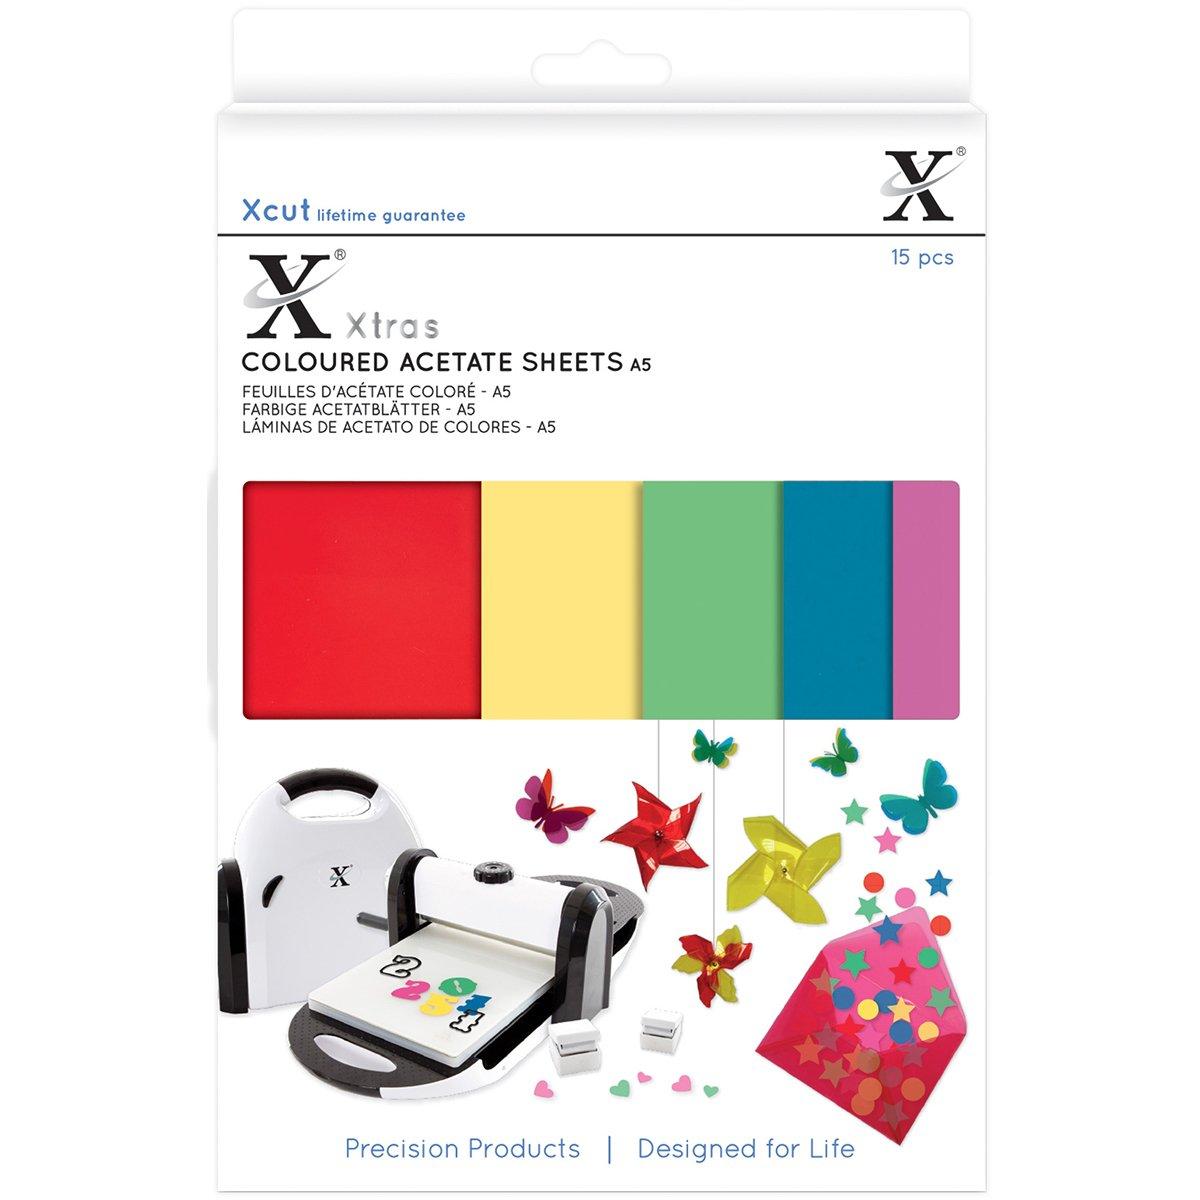 Xcut Xtra A5 Colored Acetate Sheets 15/Pkg-